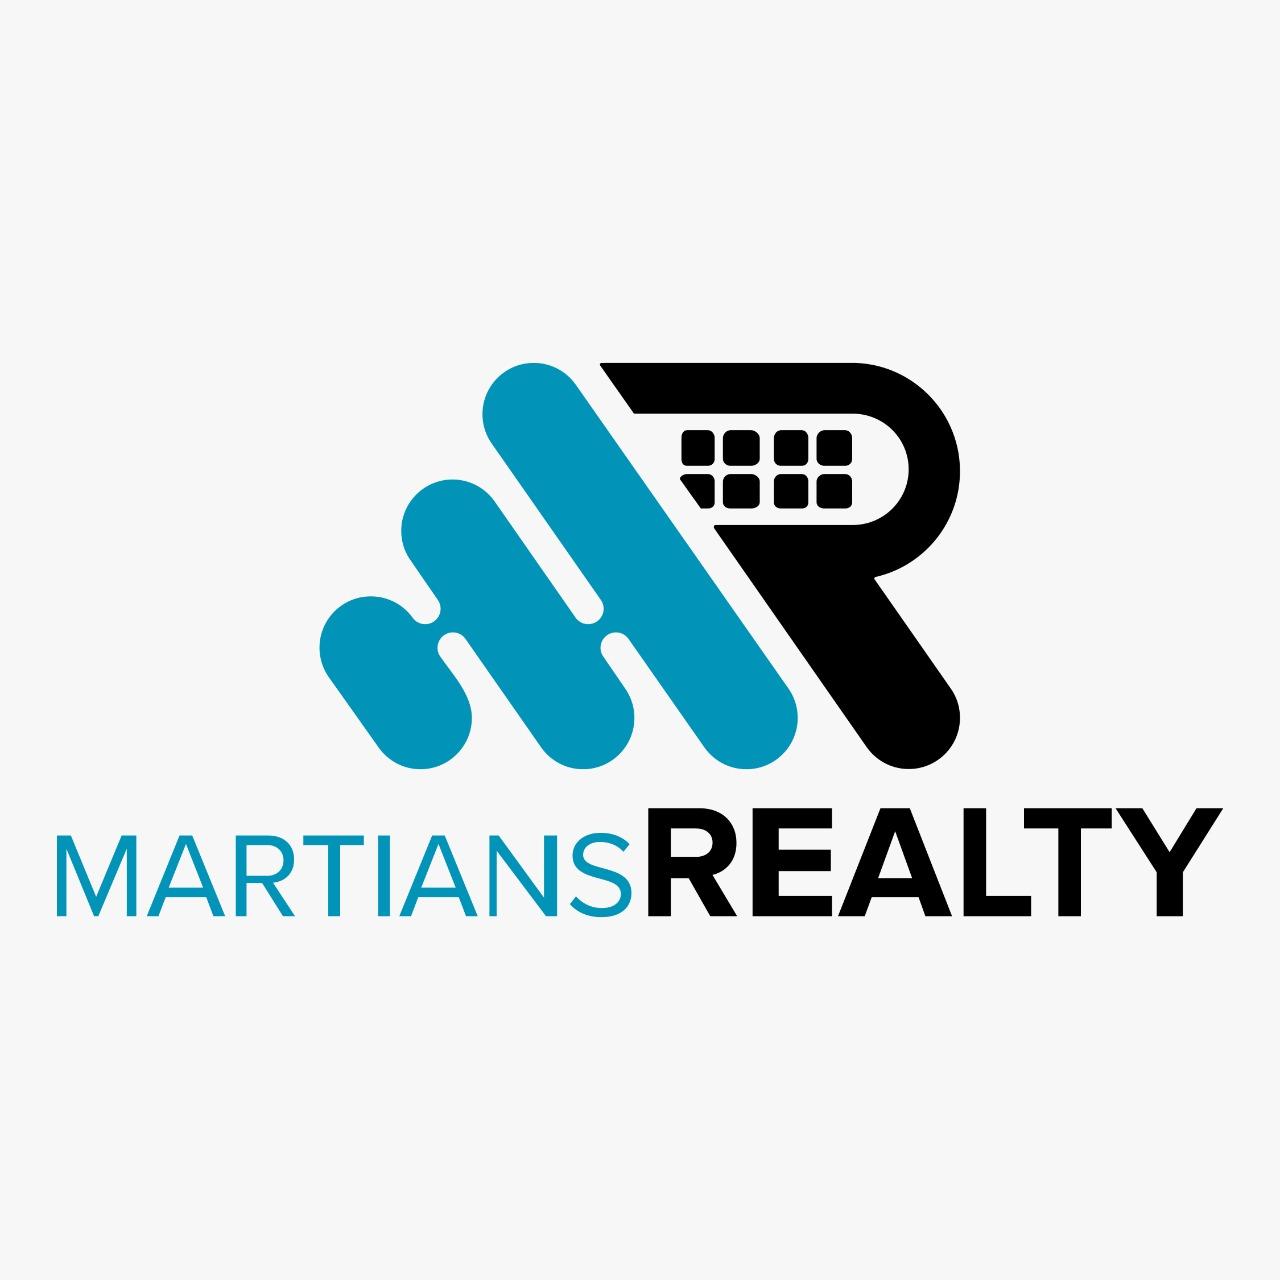 Martians Realty